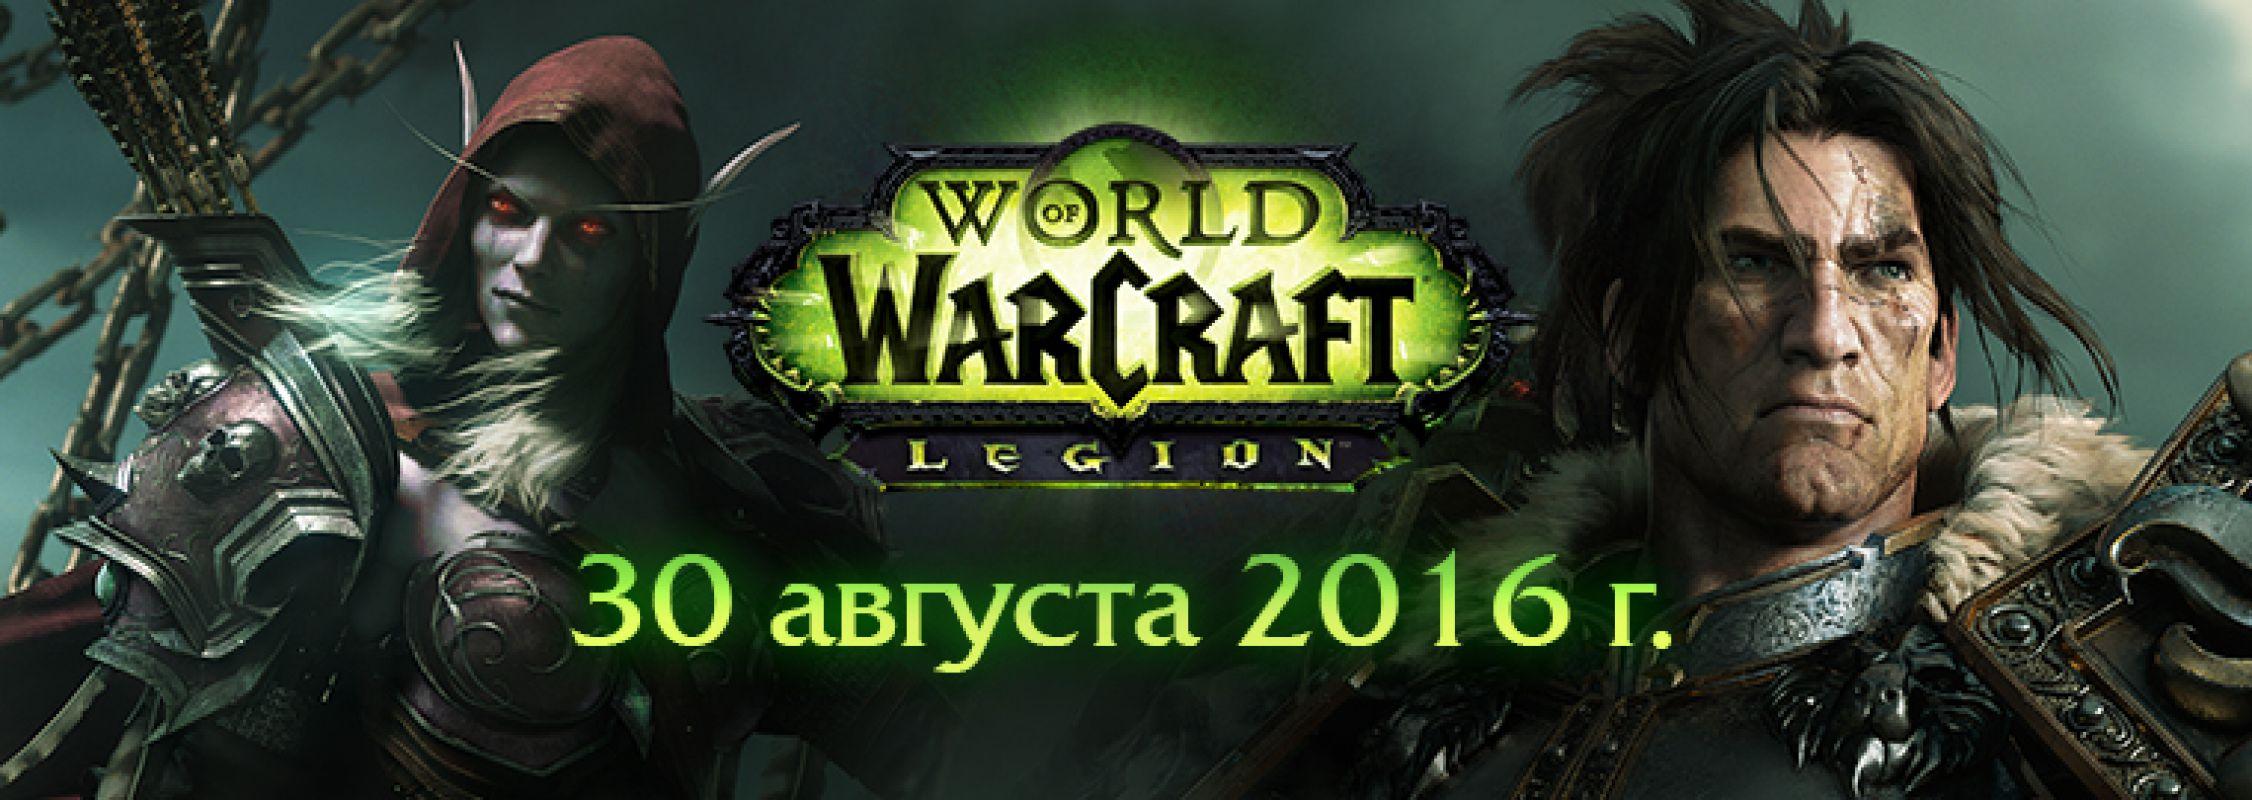 Объявлена дата выхода World of Warcraft Legion